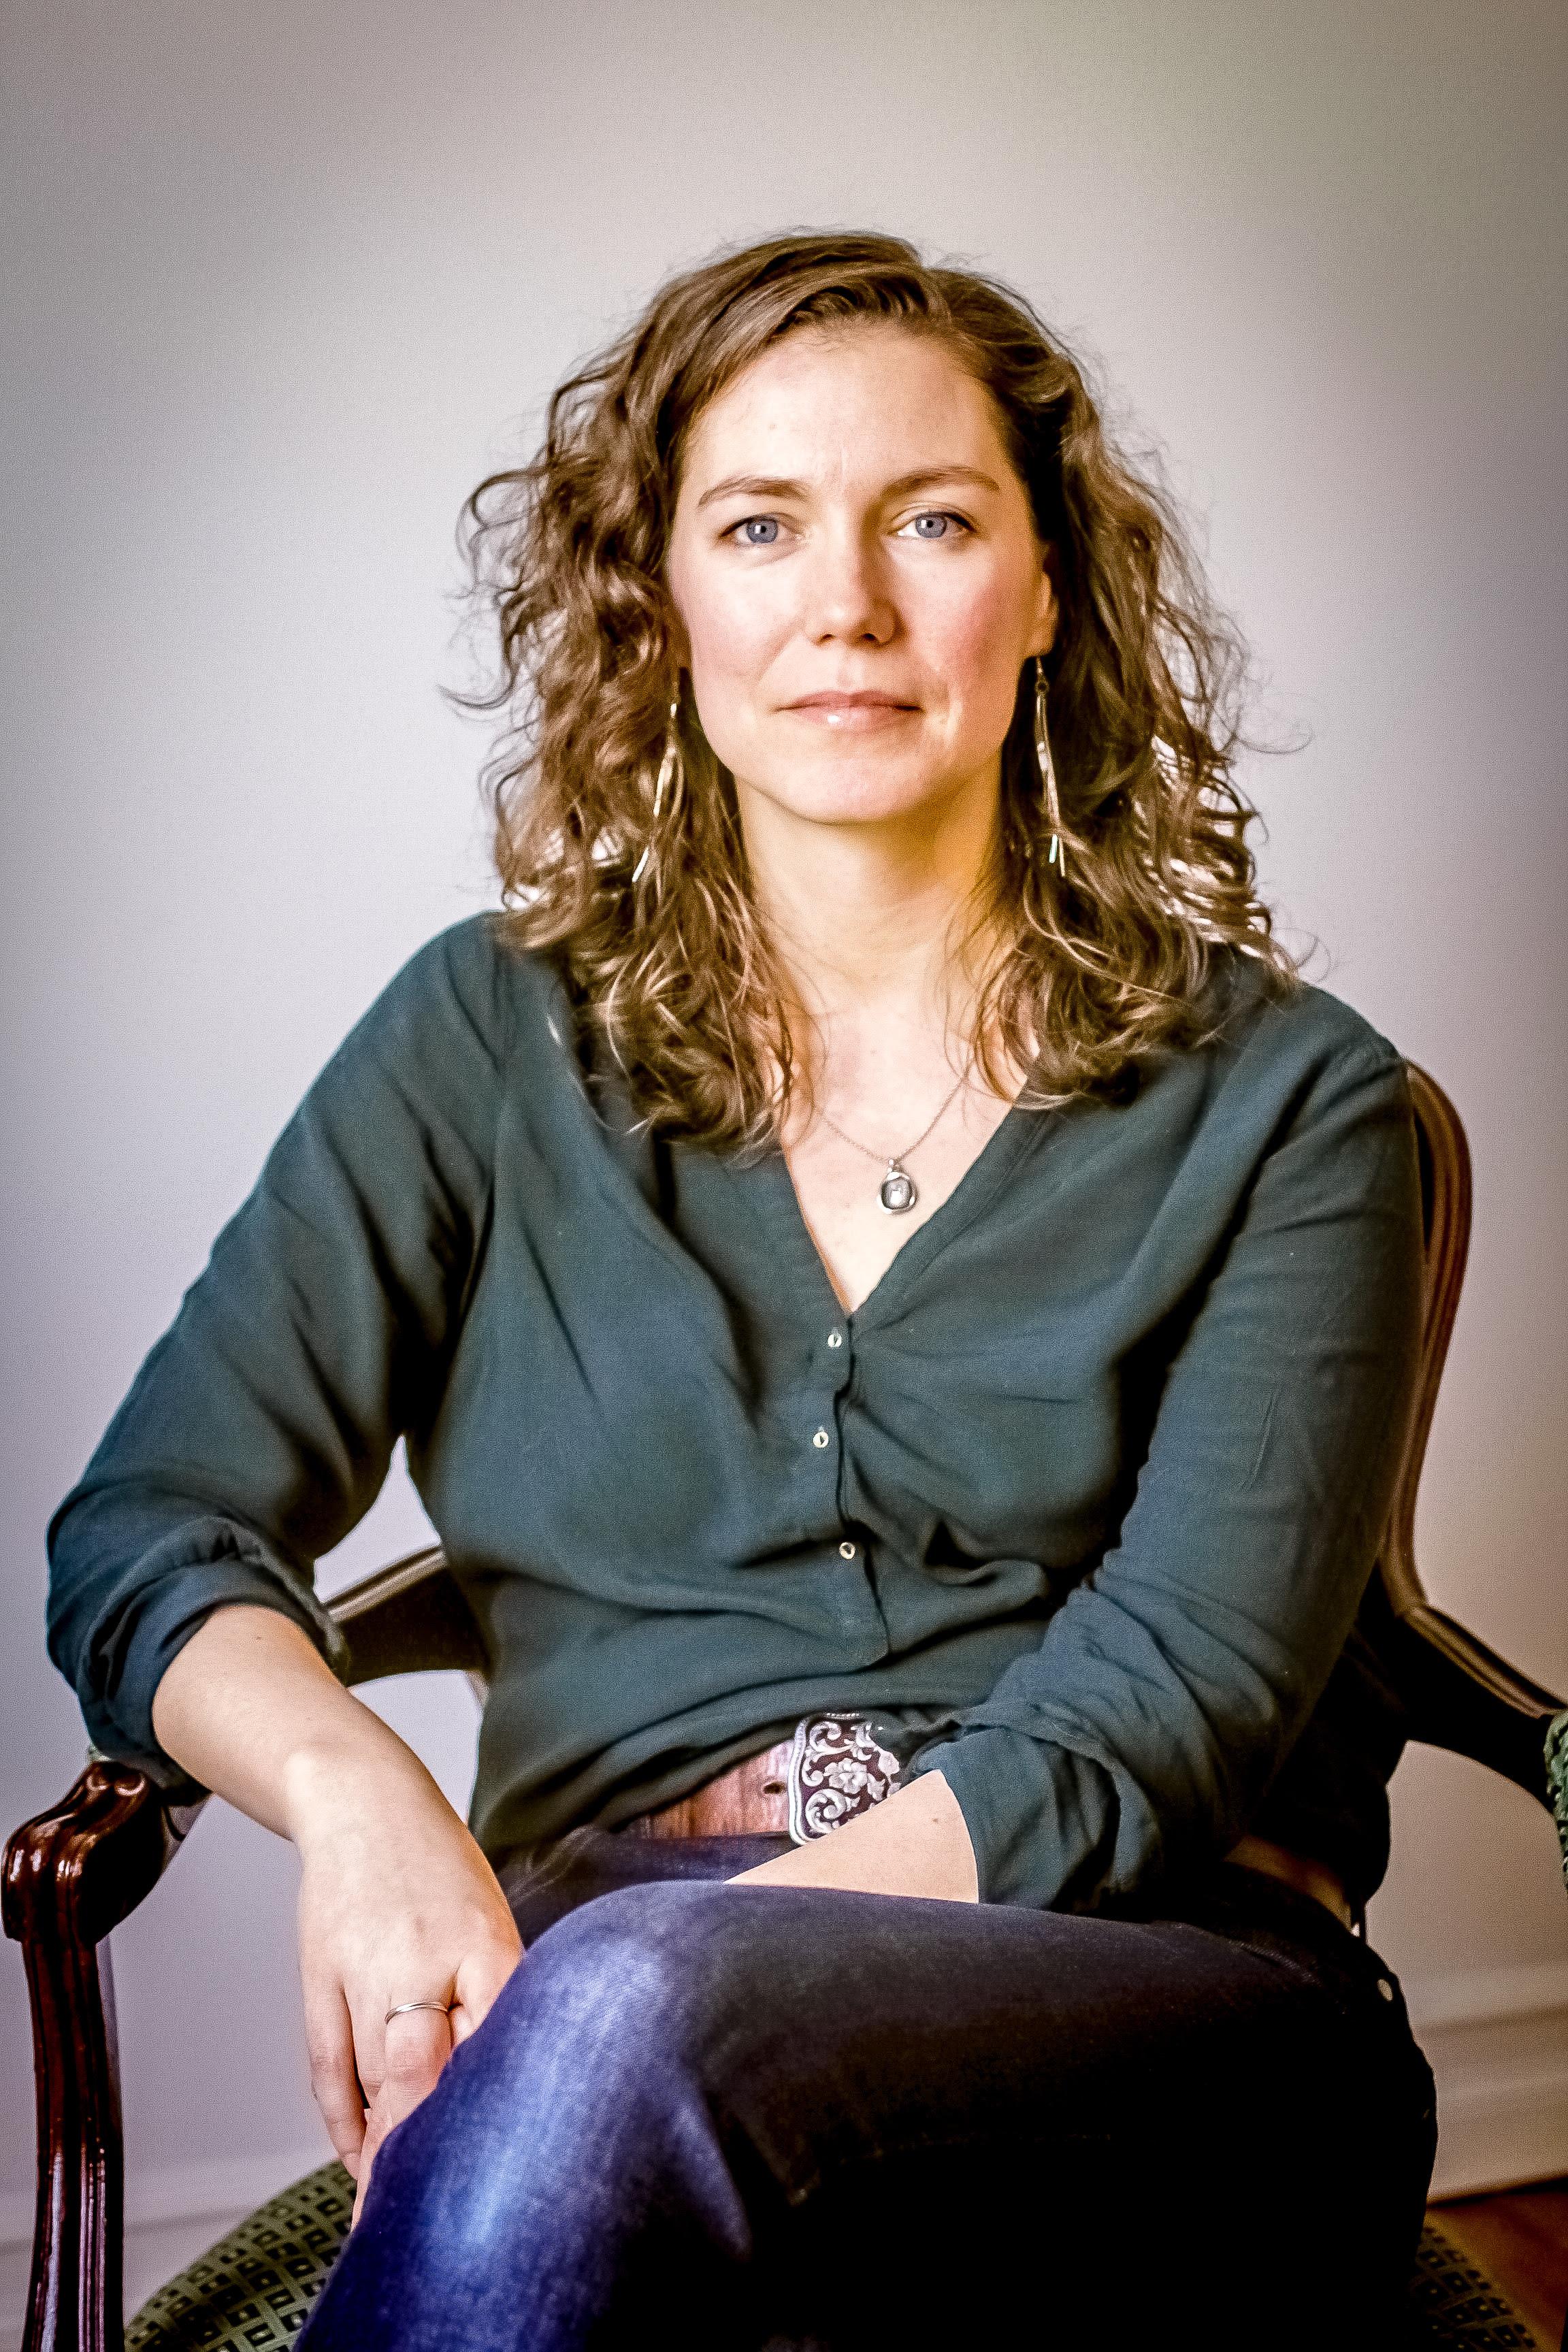 Catherine MacLellan photo by Millefiore Clarkes